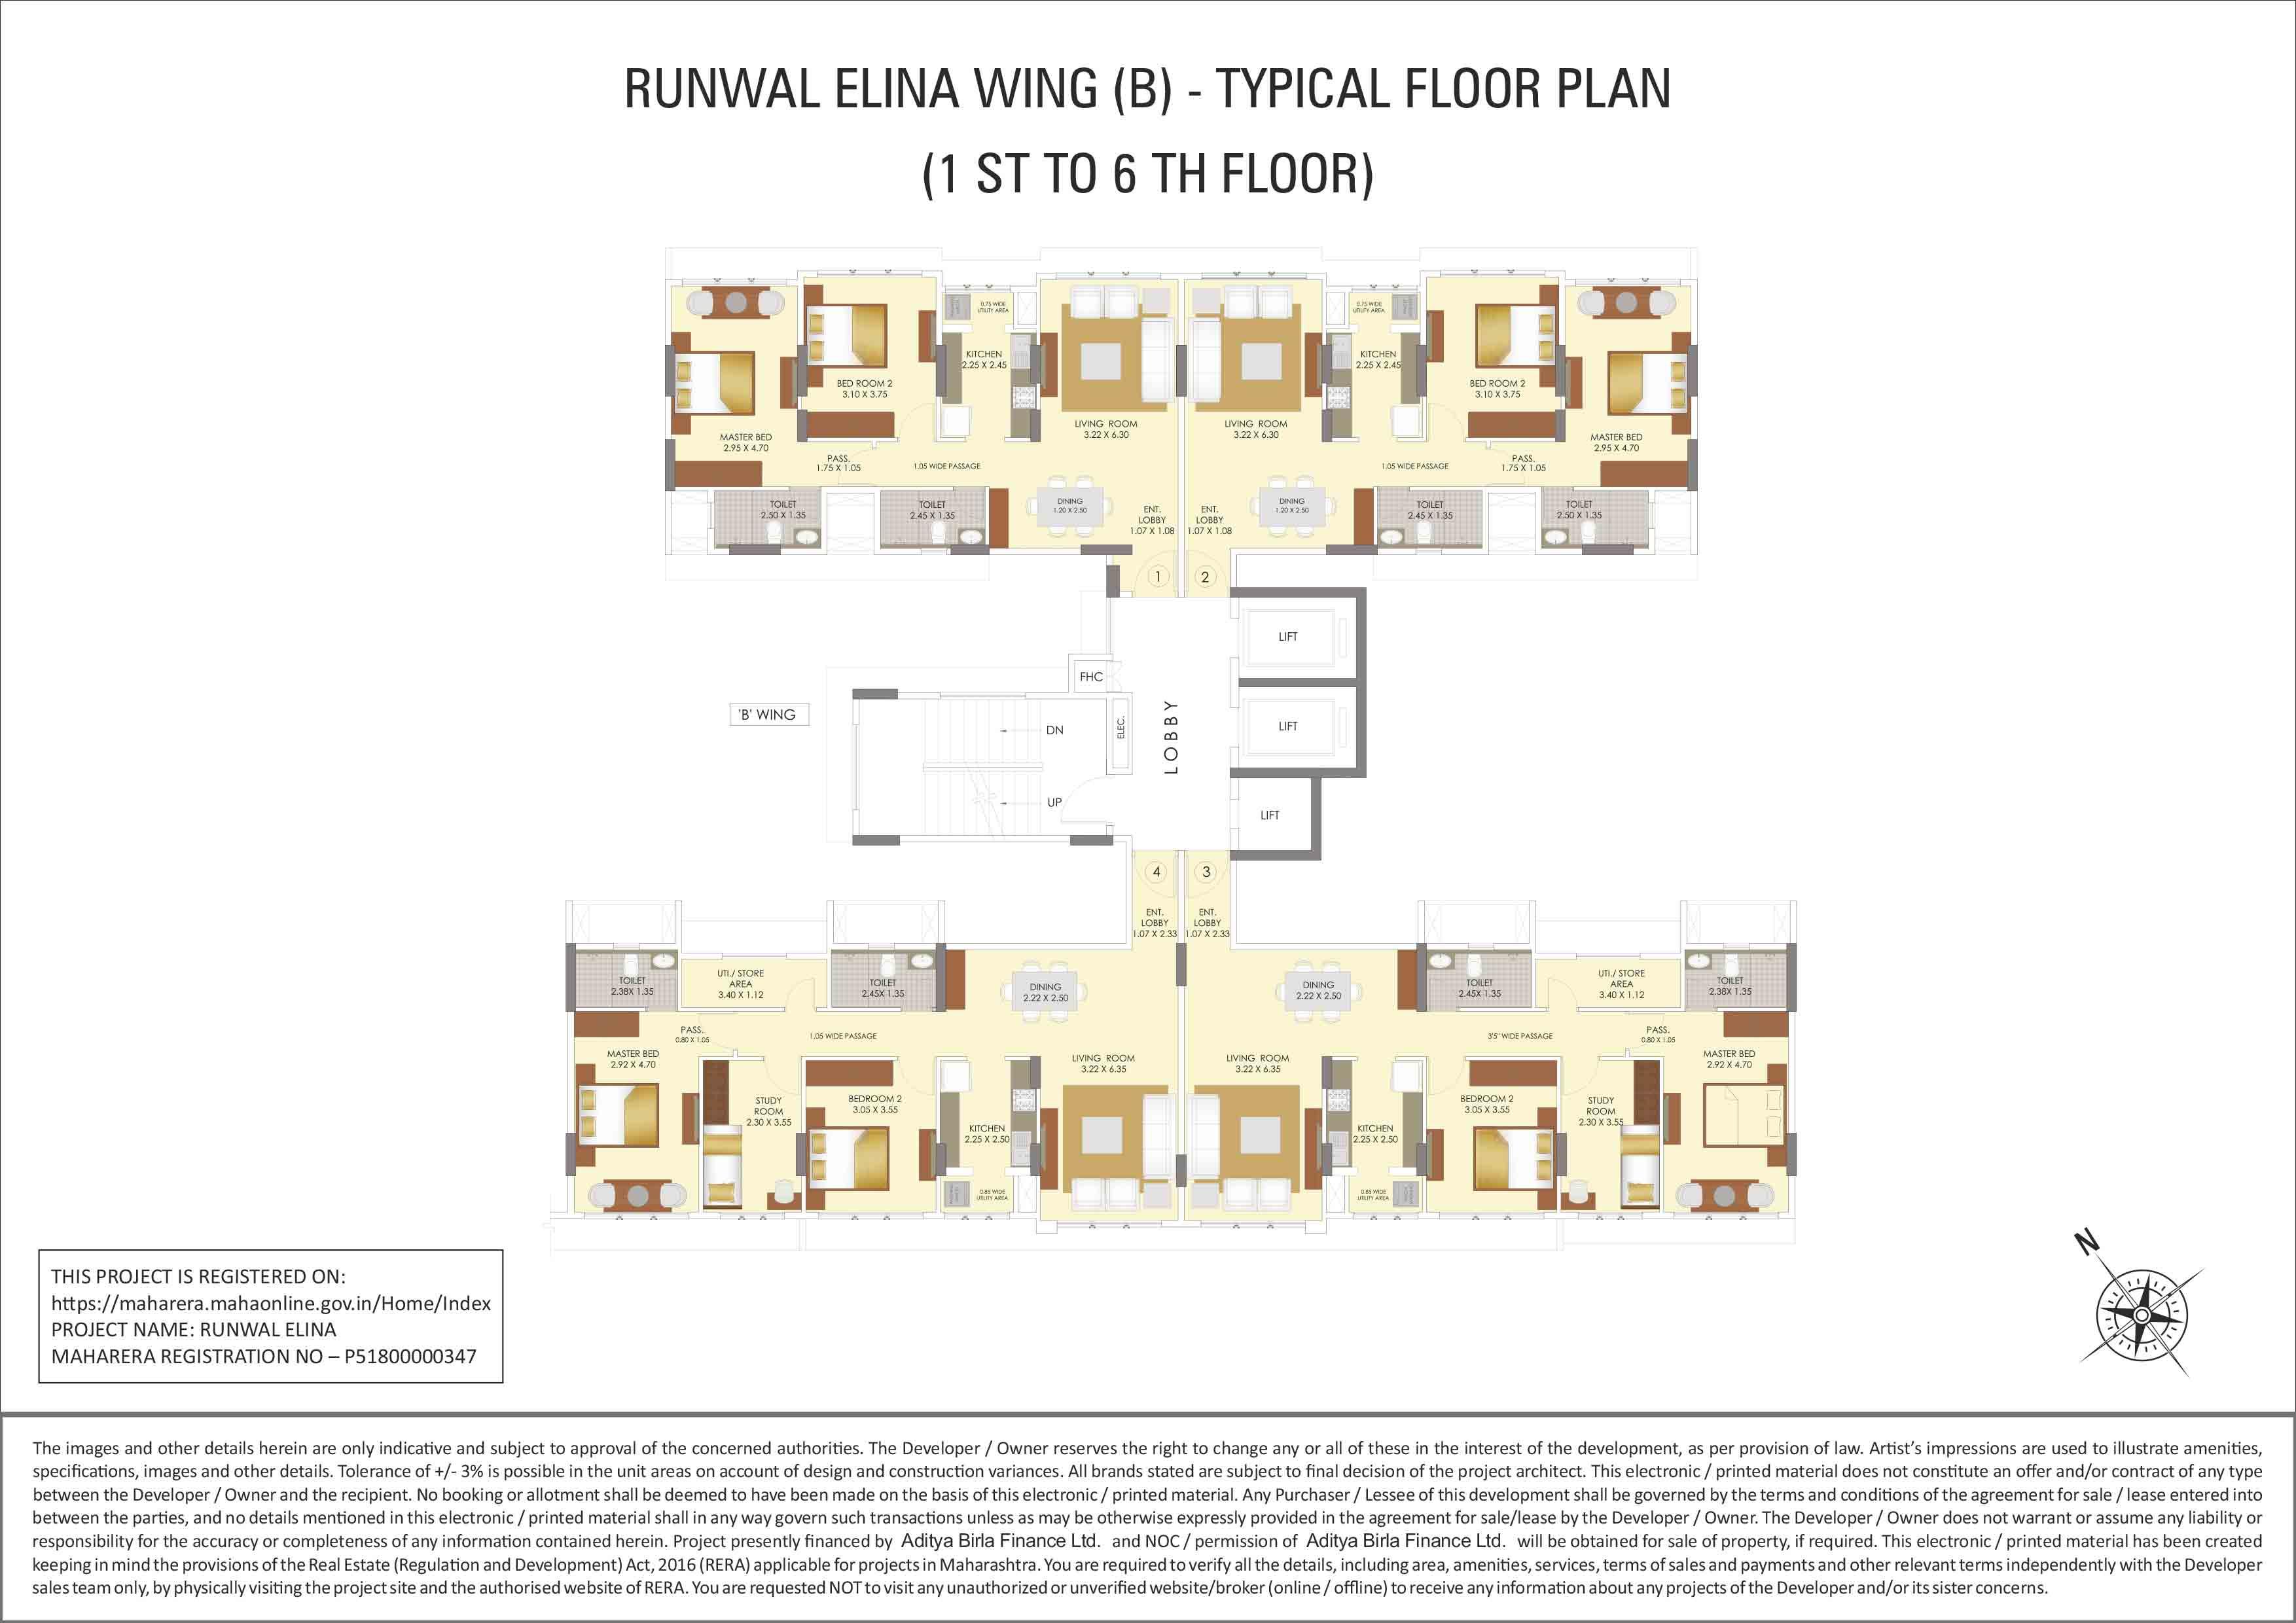 Runwal Elina Plans 3 Bhk Luxury Flats In Saki Naka Andheri East Diagram Sixth Floor Layout 1st To 6th Plan